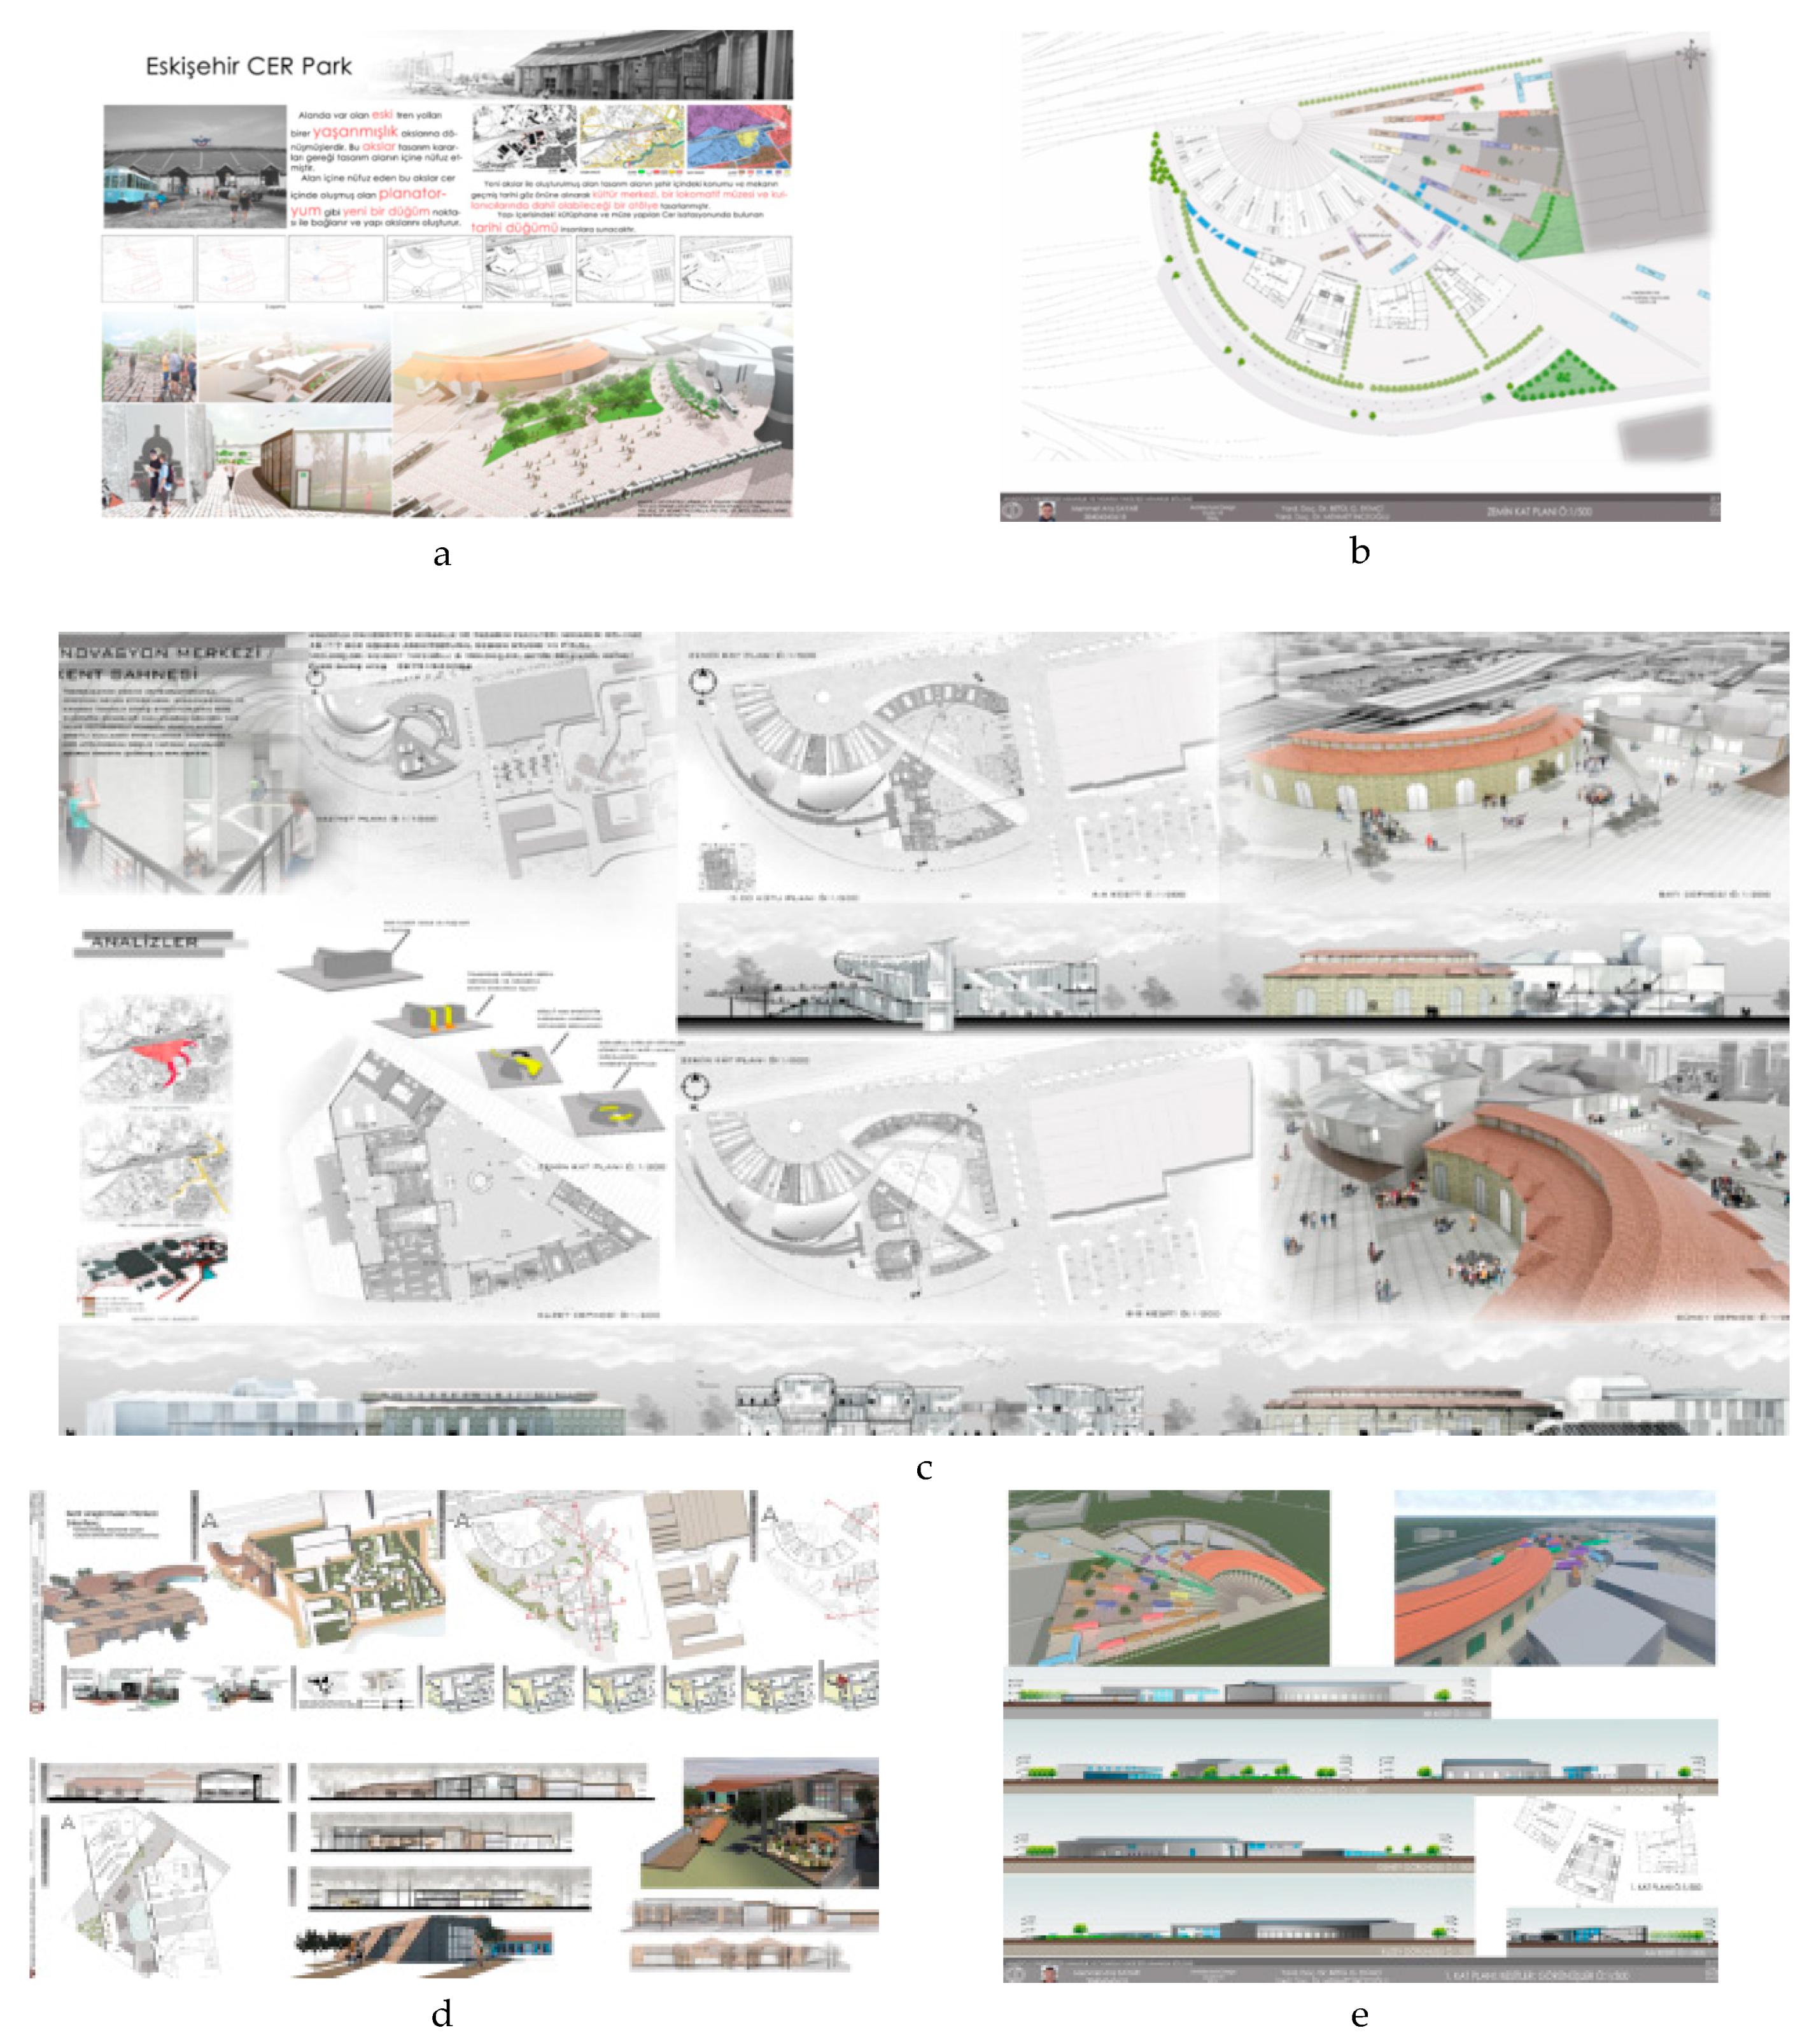 Heritage | Free Full-Text | Railroad Buildings of Eskişehir